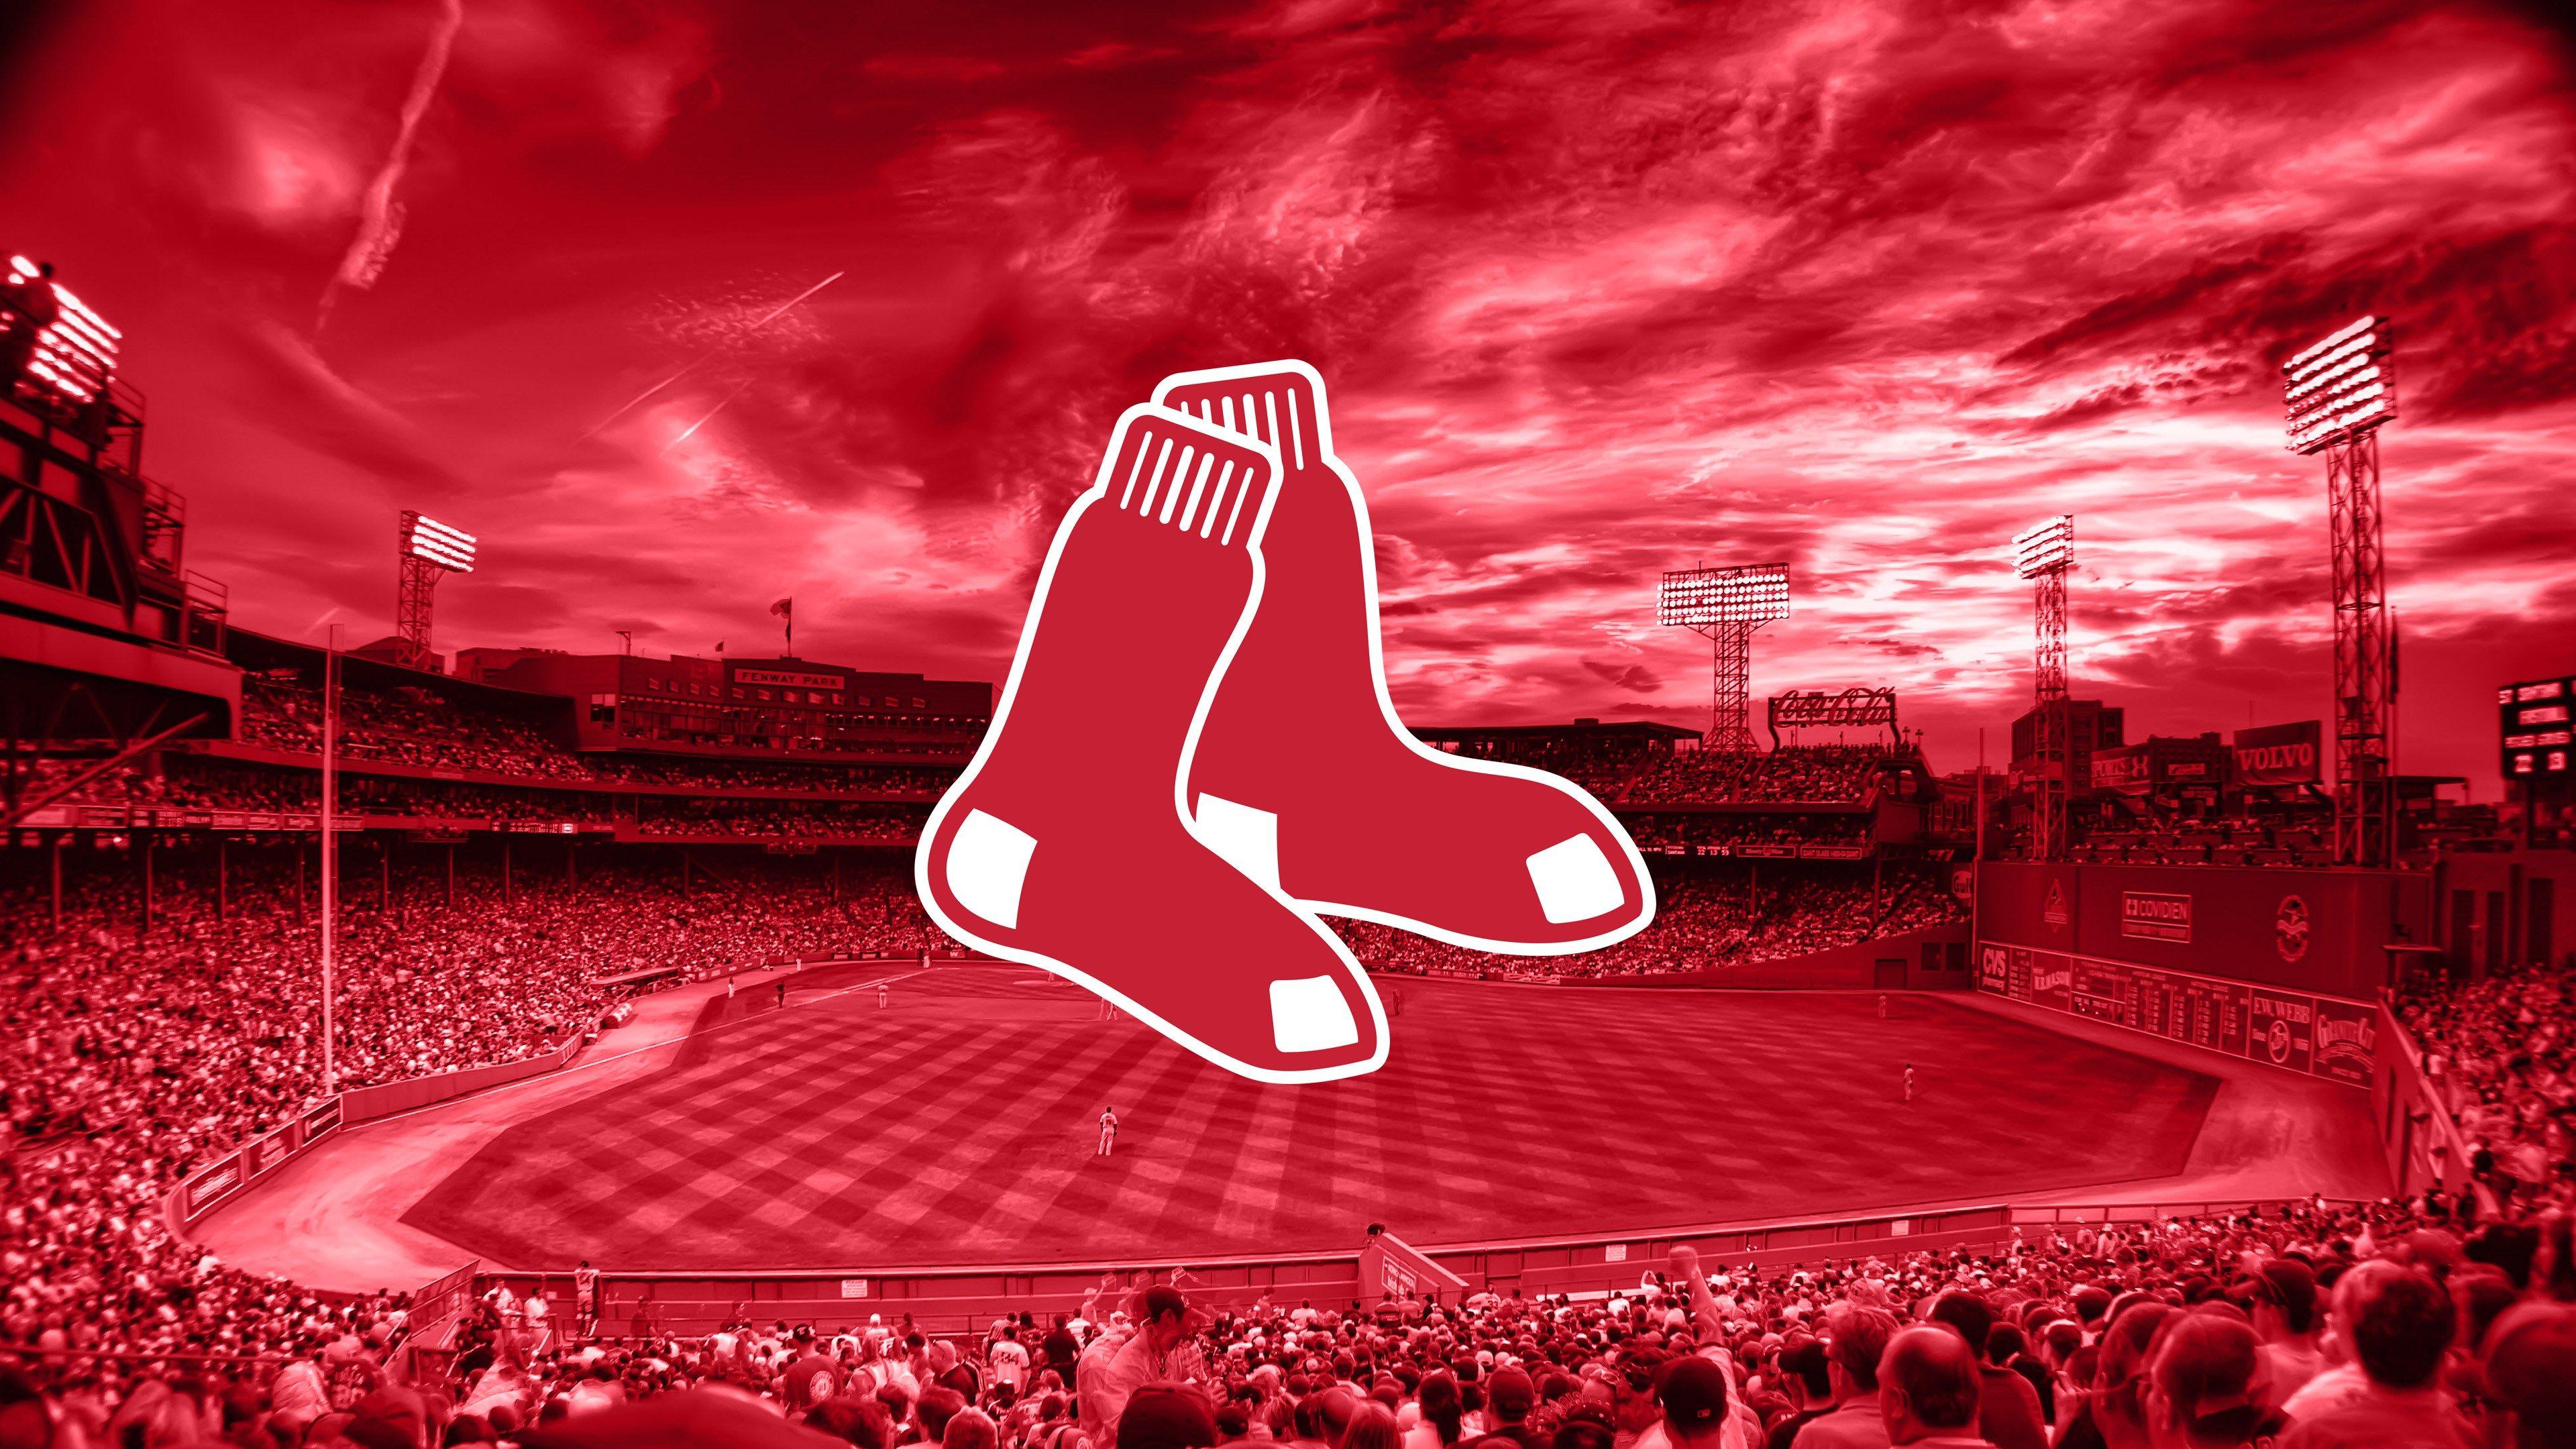 boston red sox logo desktop background ololoshenka Boston red 3840x2160